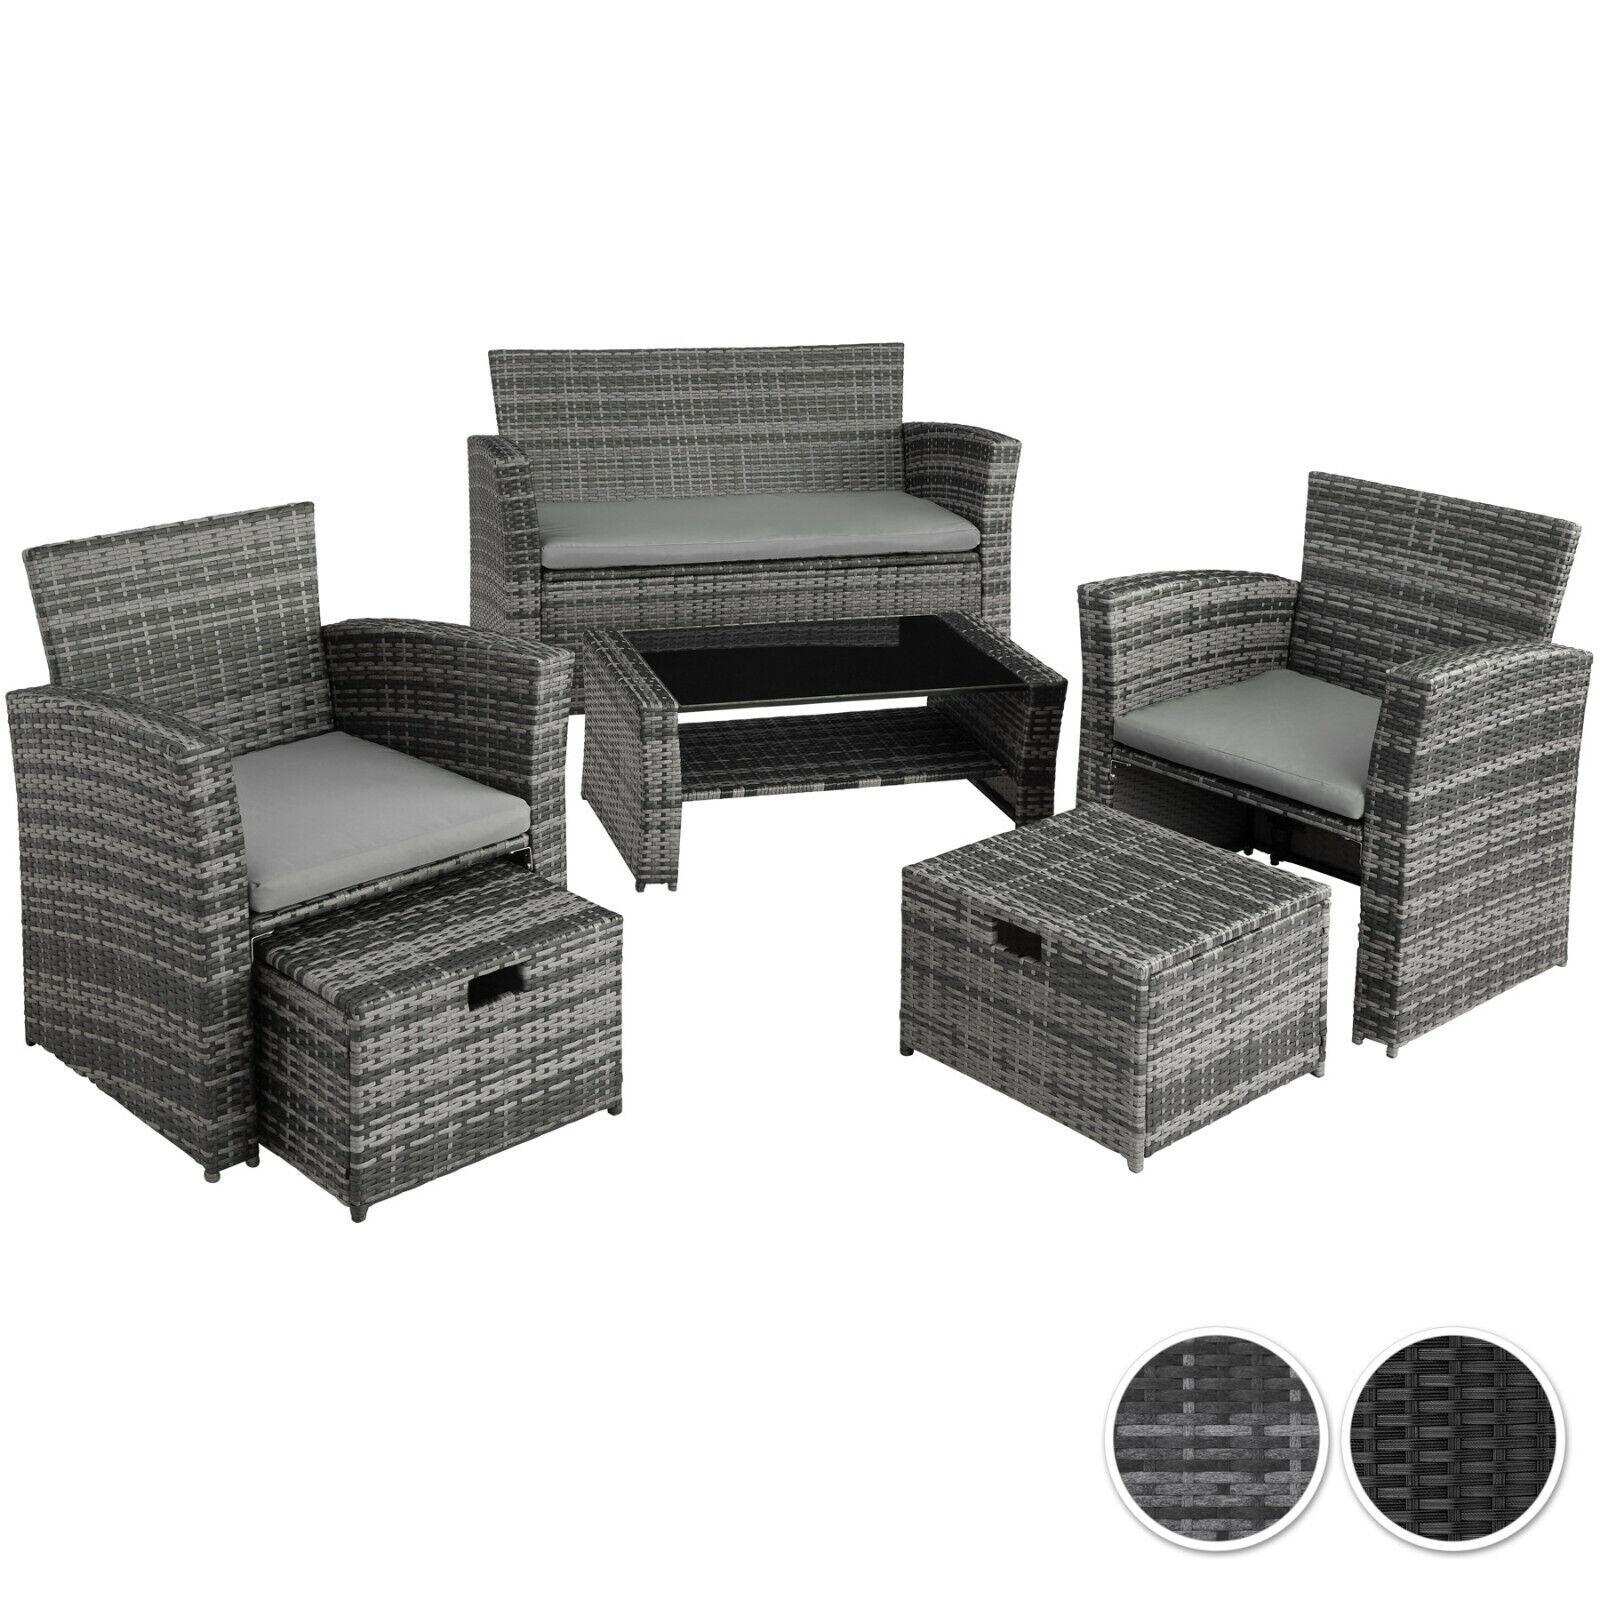 Remarkable Seats Sofa Set Lounge Seating Rattan Stools Garden Patio Cjindustries Chair Design For Home Cjindustriesco